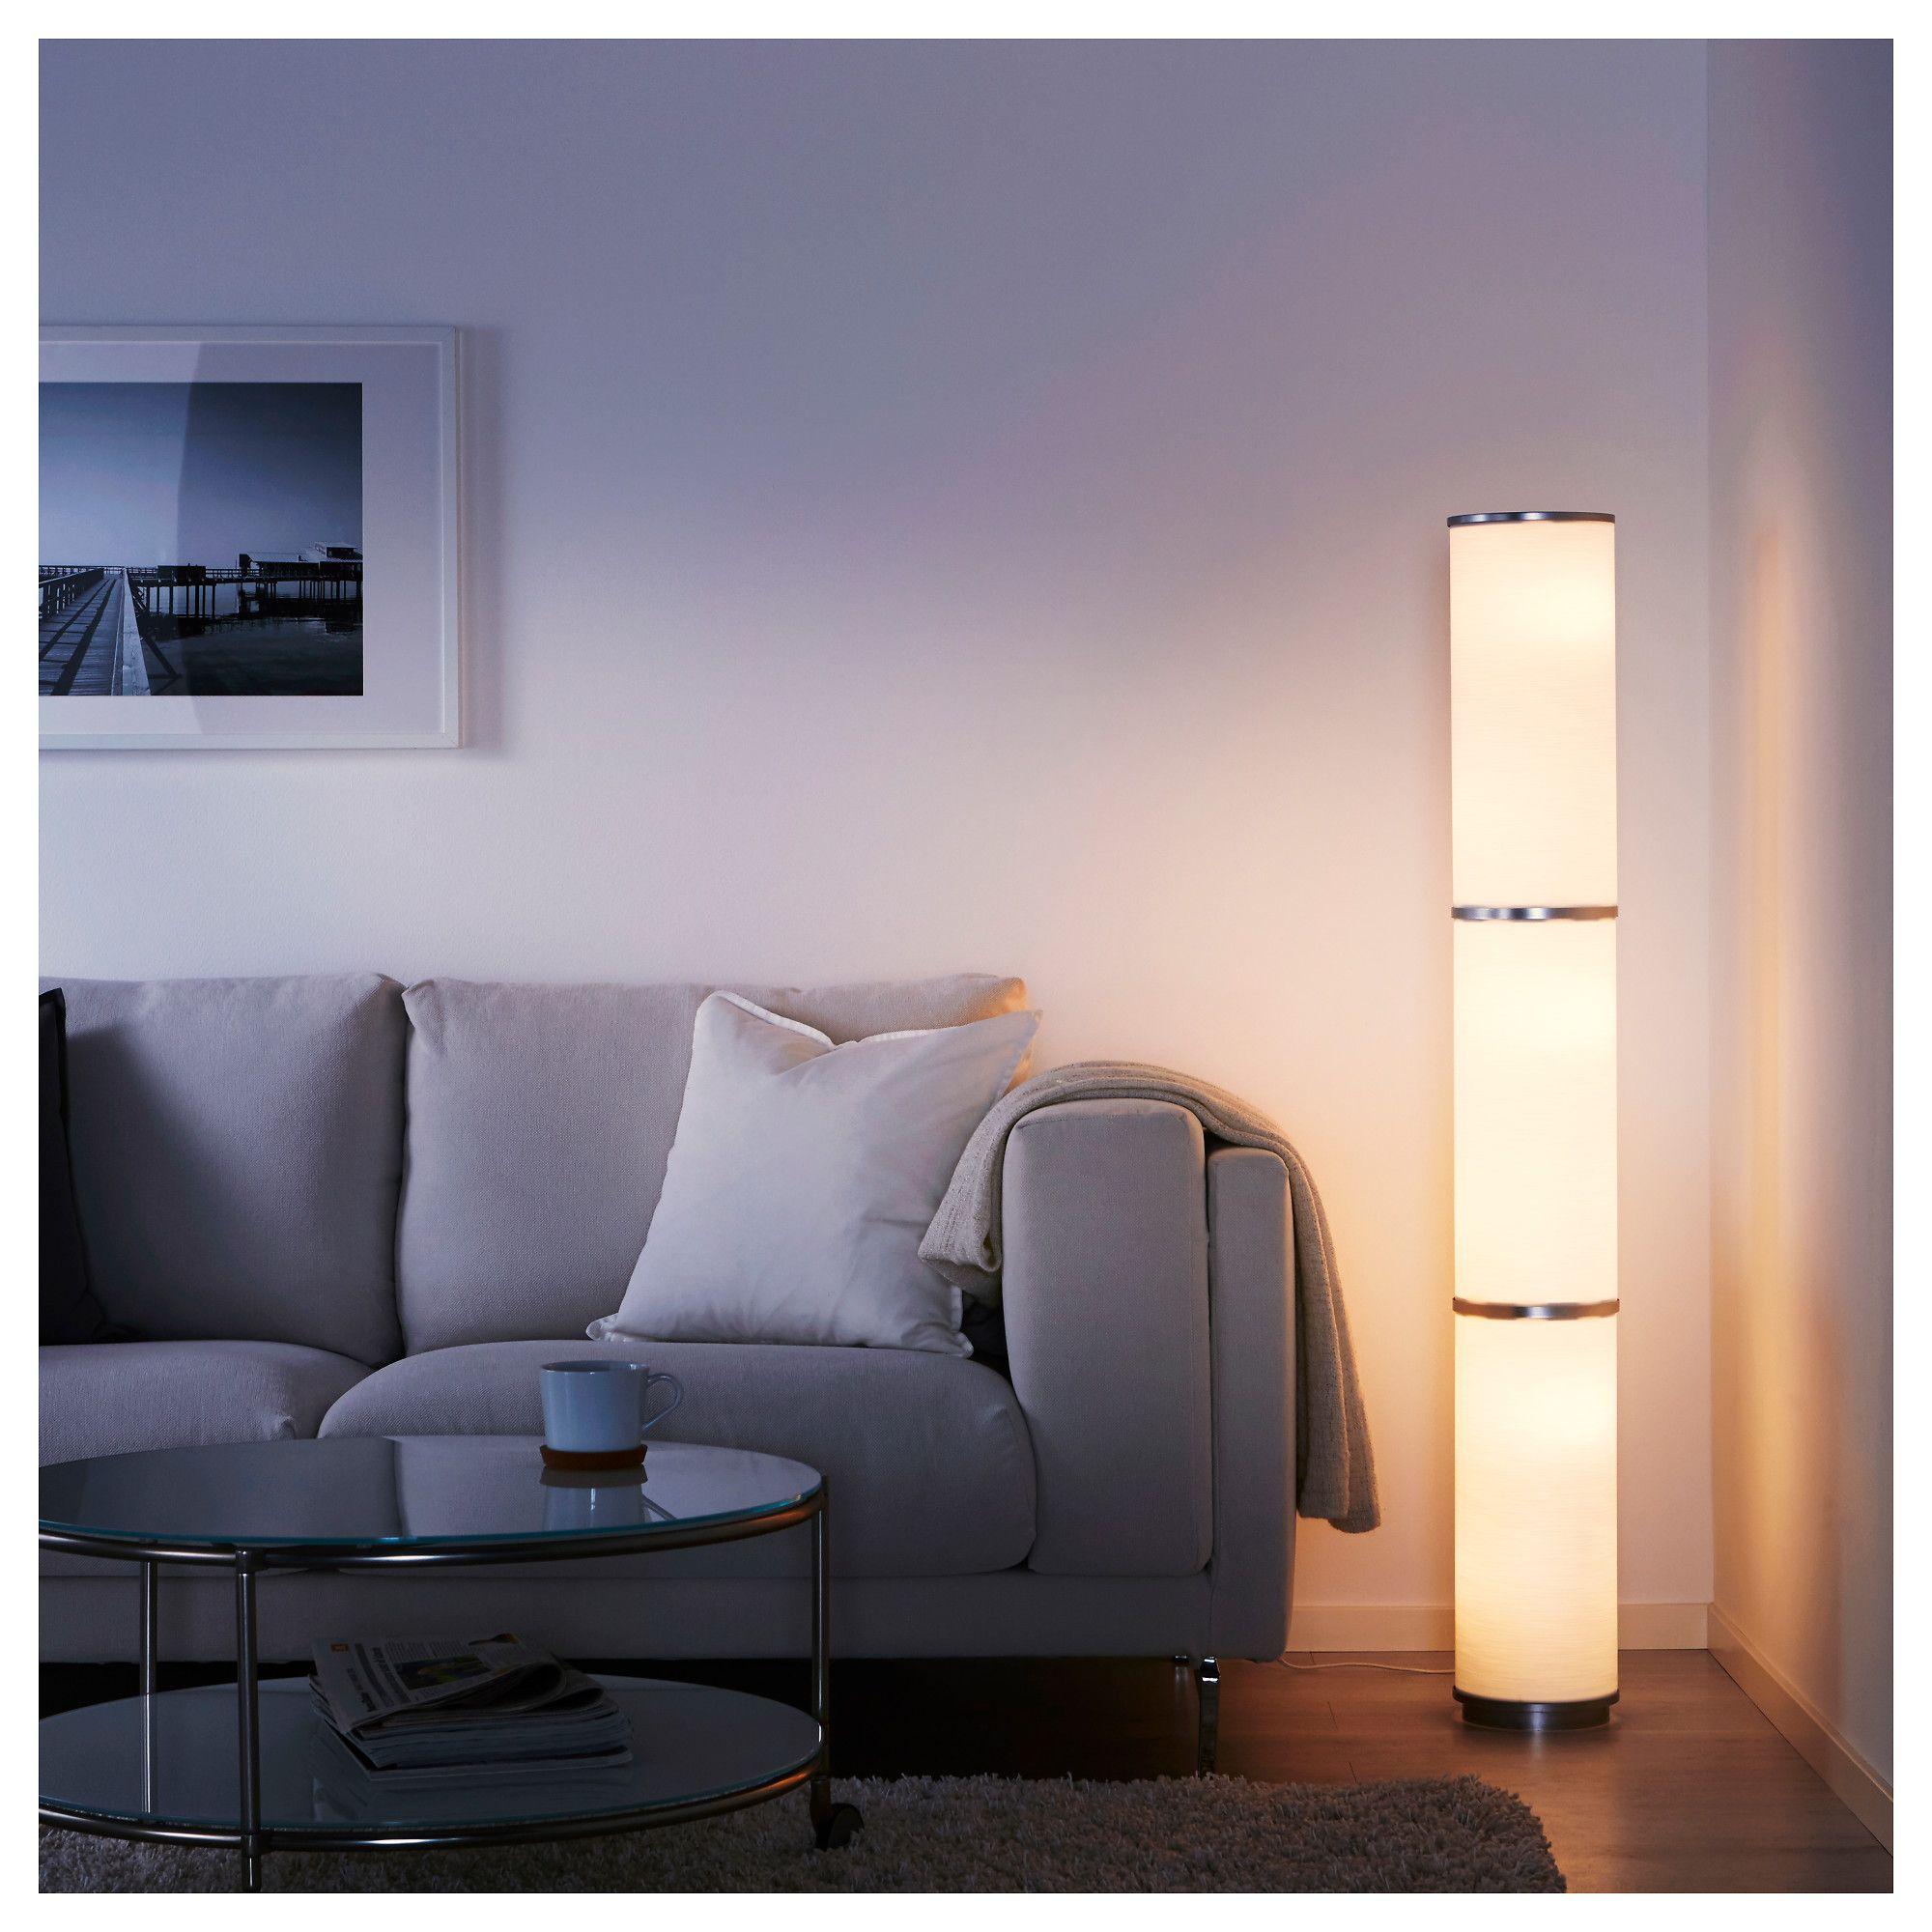 Vidja White Floor Lamp 138 Cm Ikea White Floor Lamp Floor Lamp Ikea